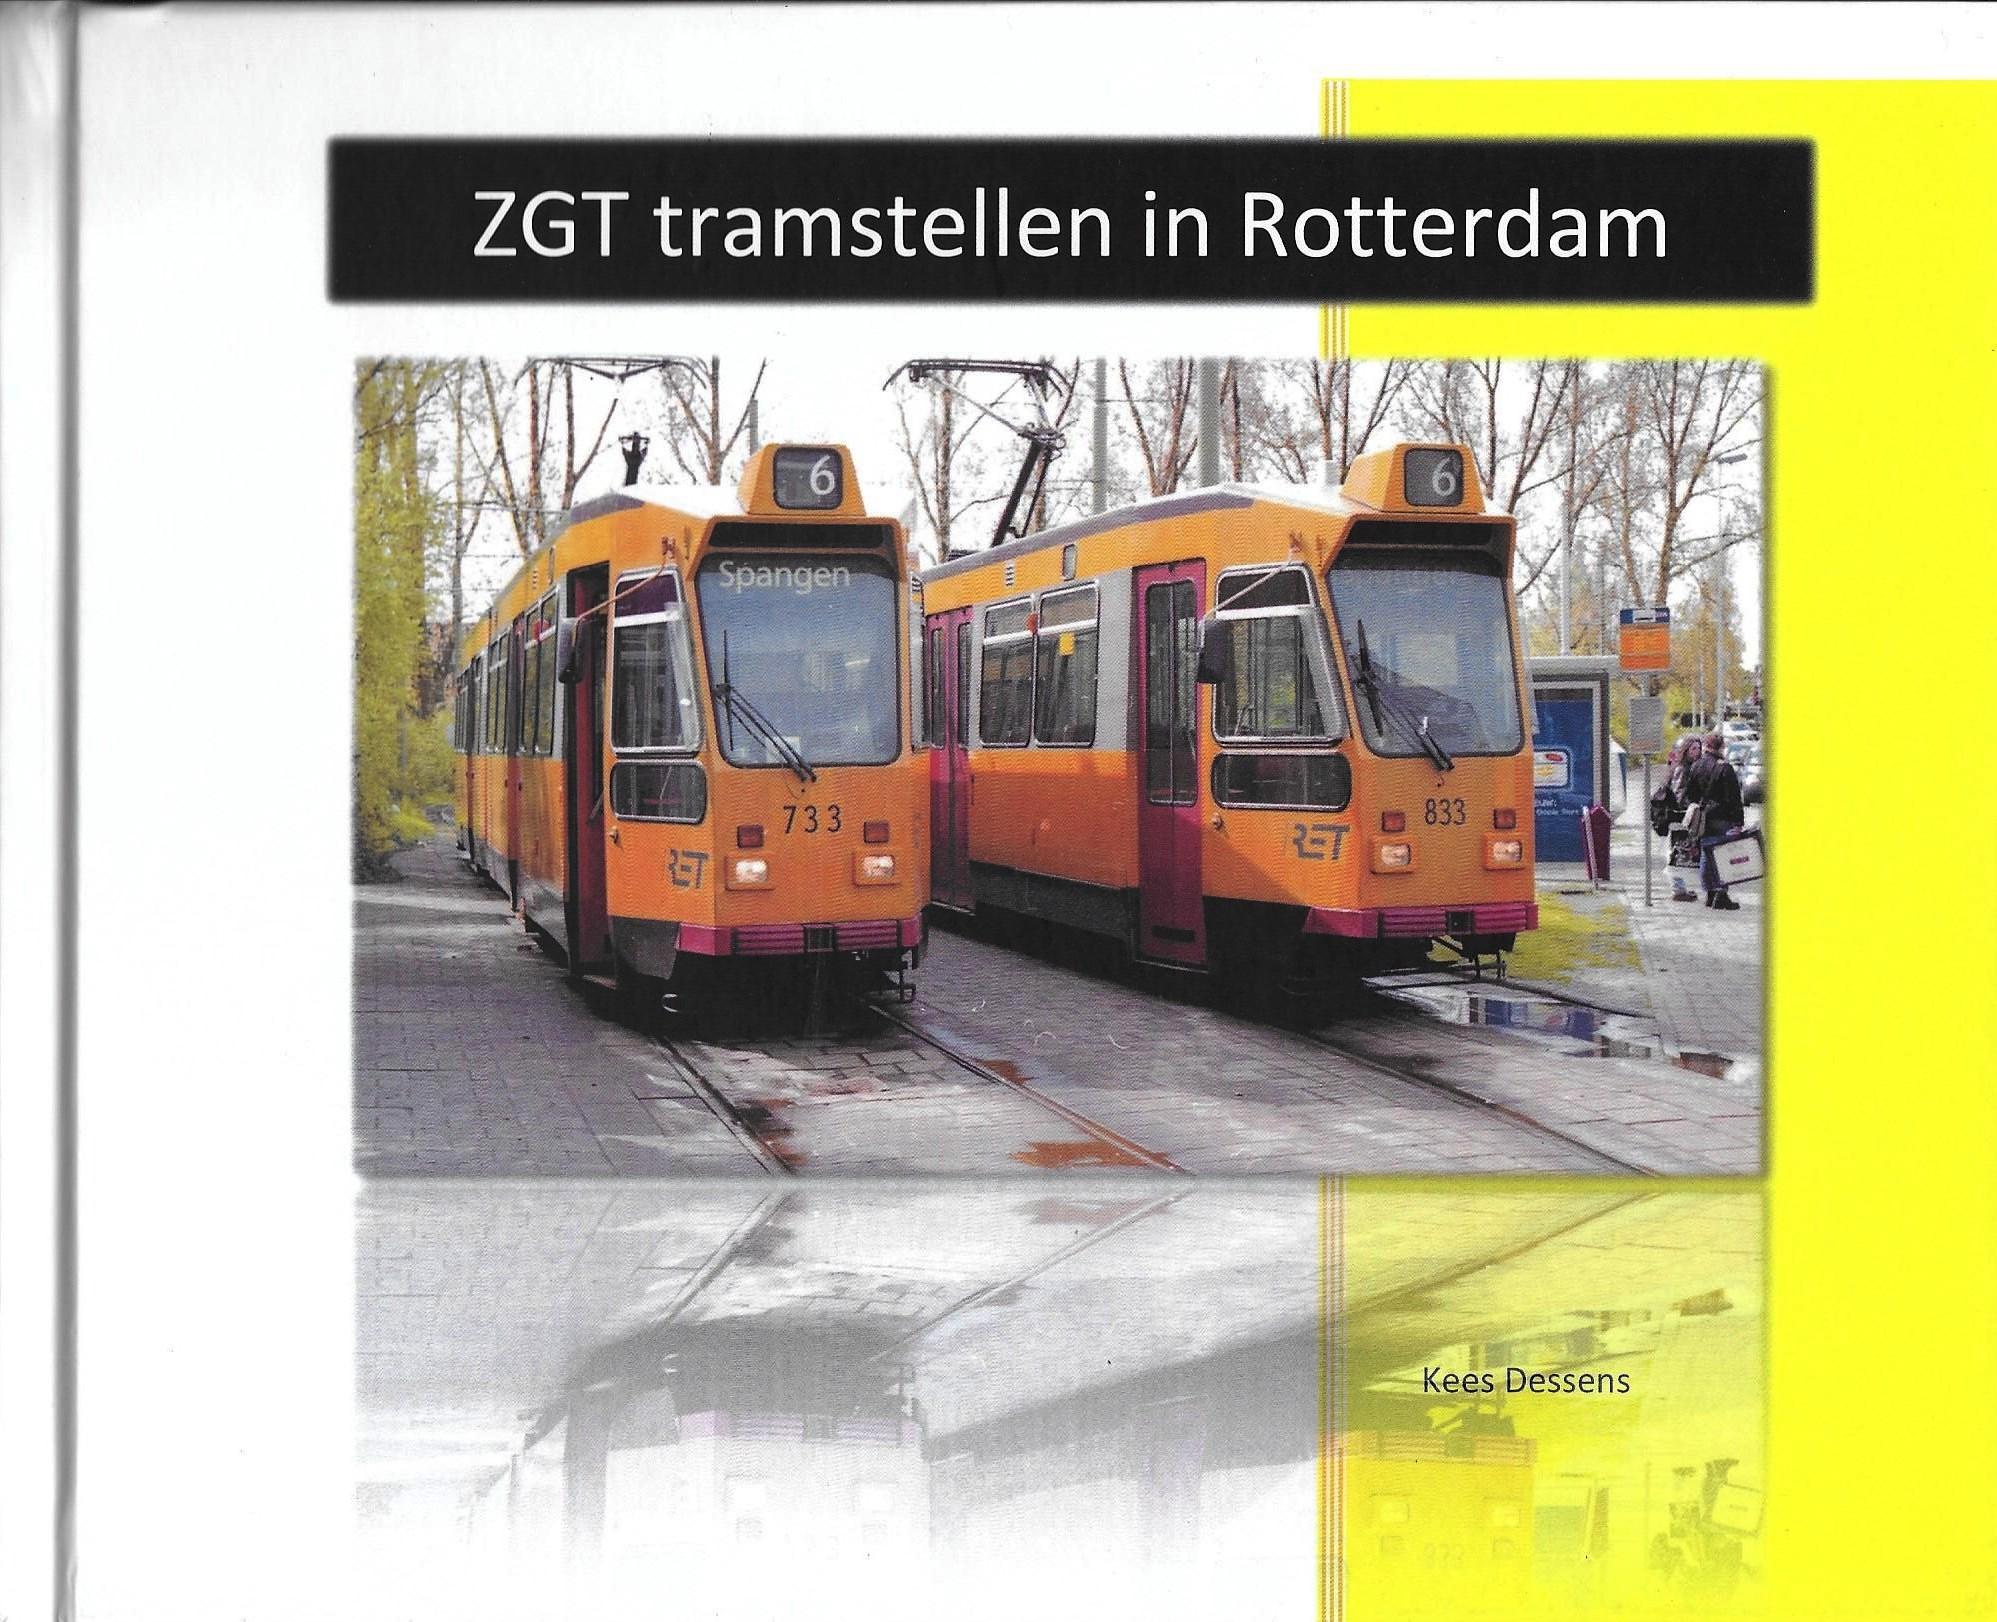 ZGT Tramstellen in Rotterdam